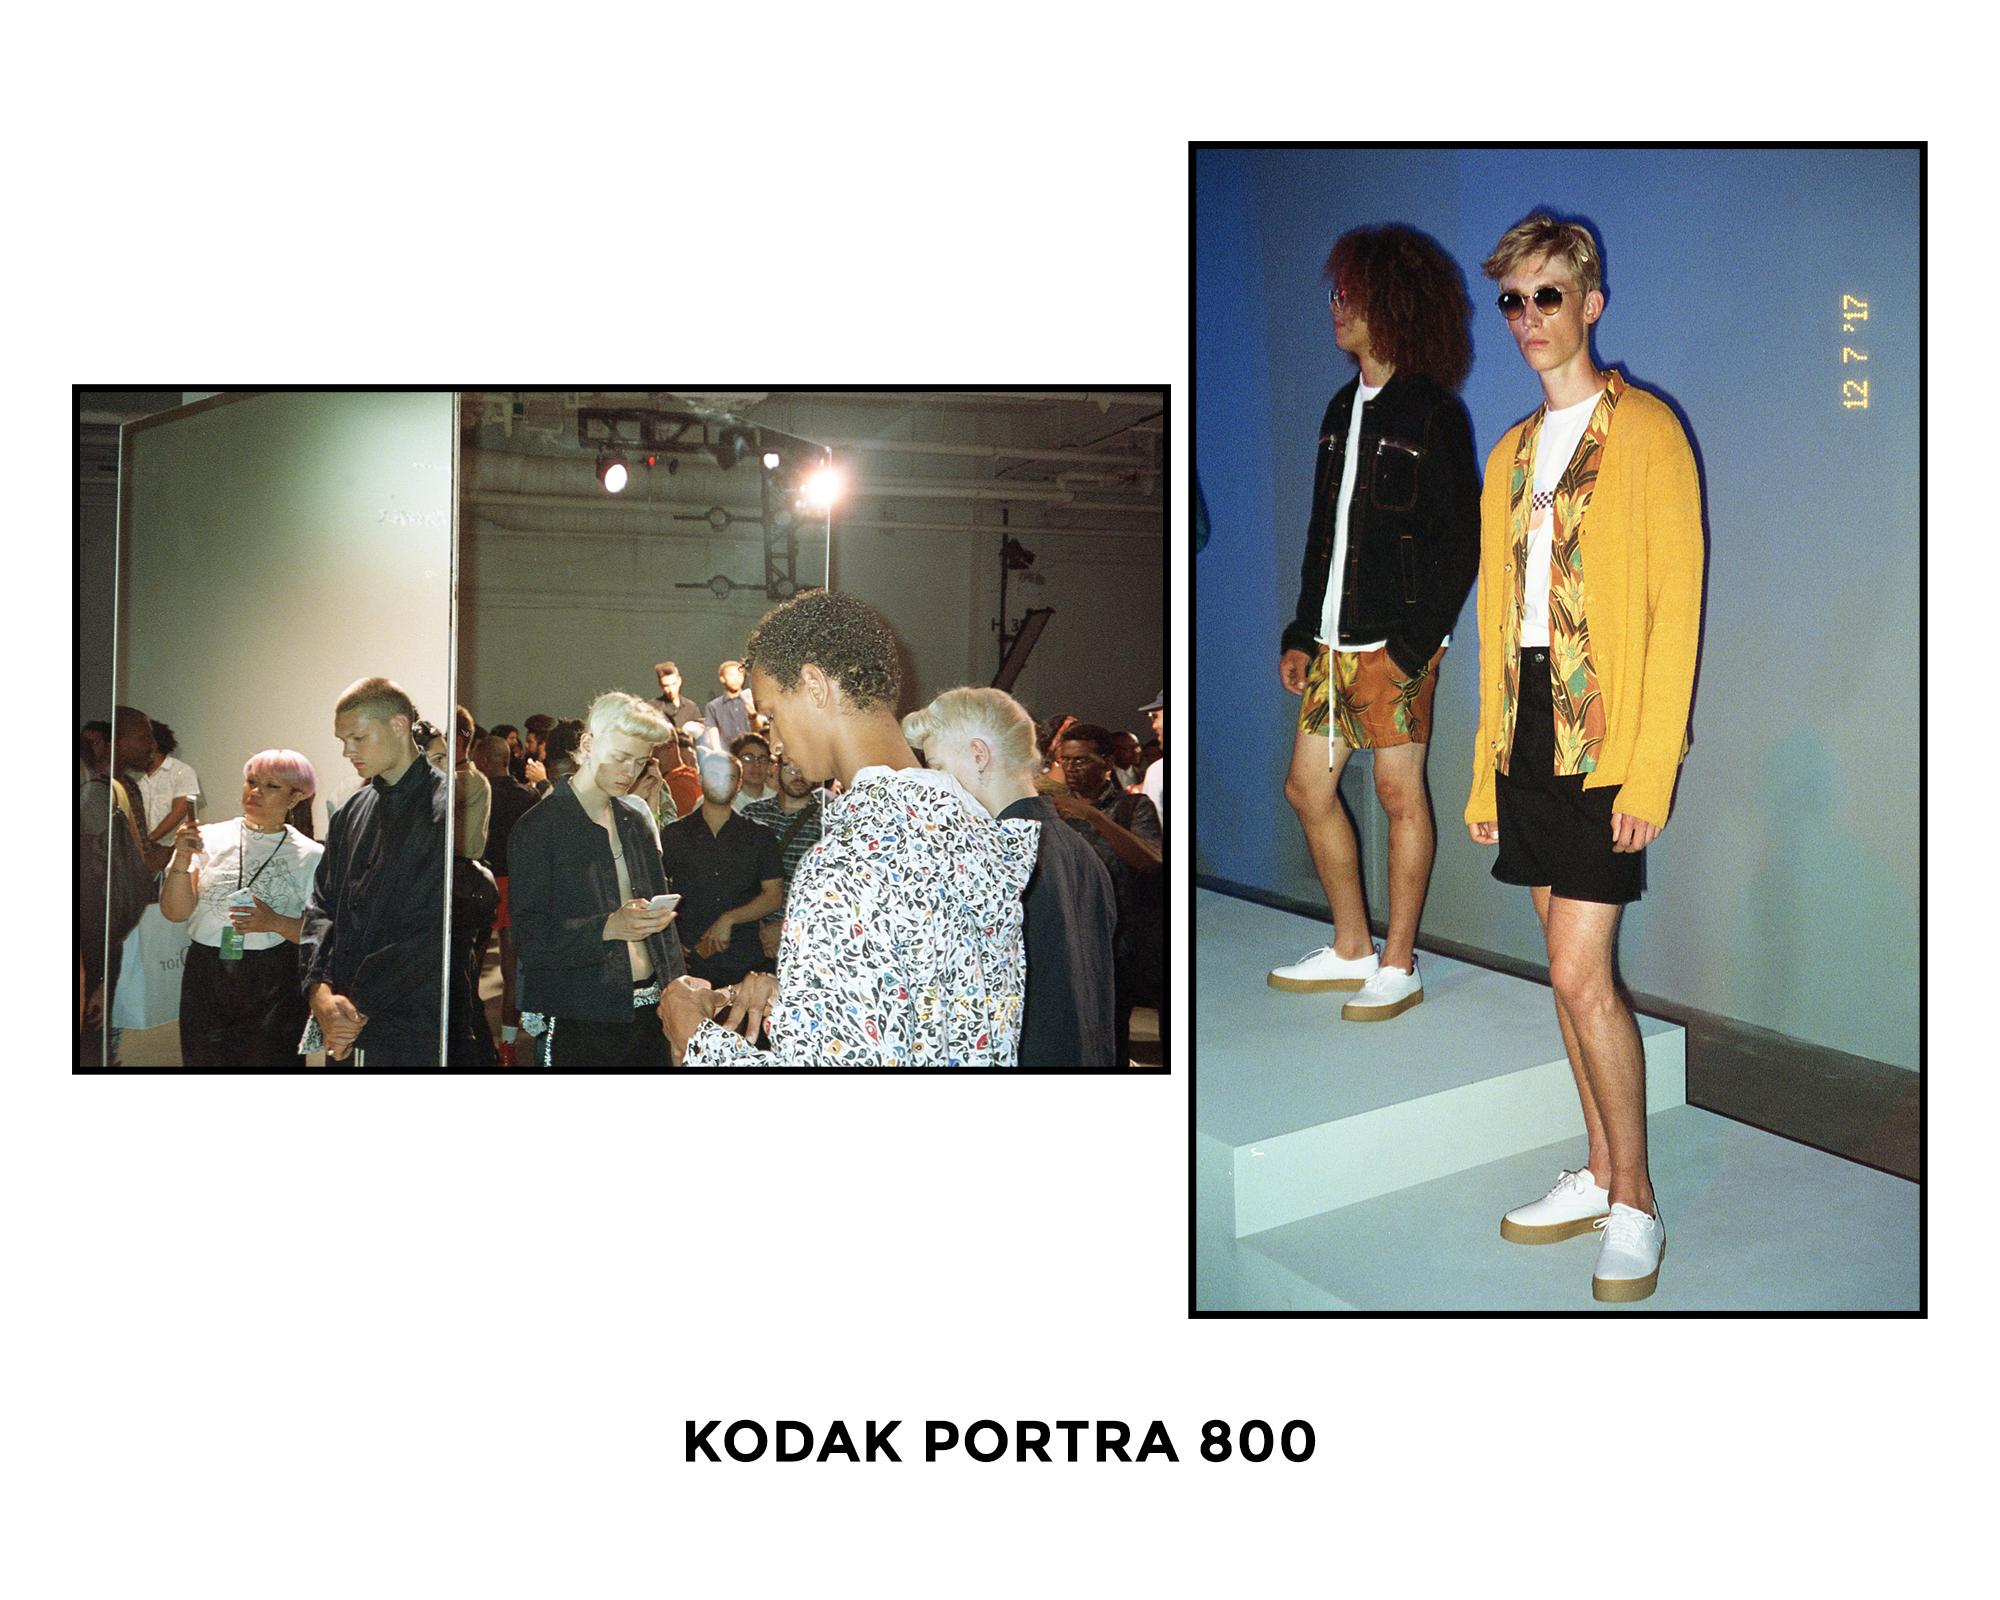 6 - Kodak Portra 400 vs. Kodak PortrA 800 - FILTERGRADE BLOG